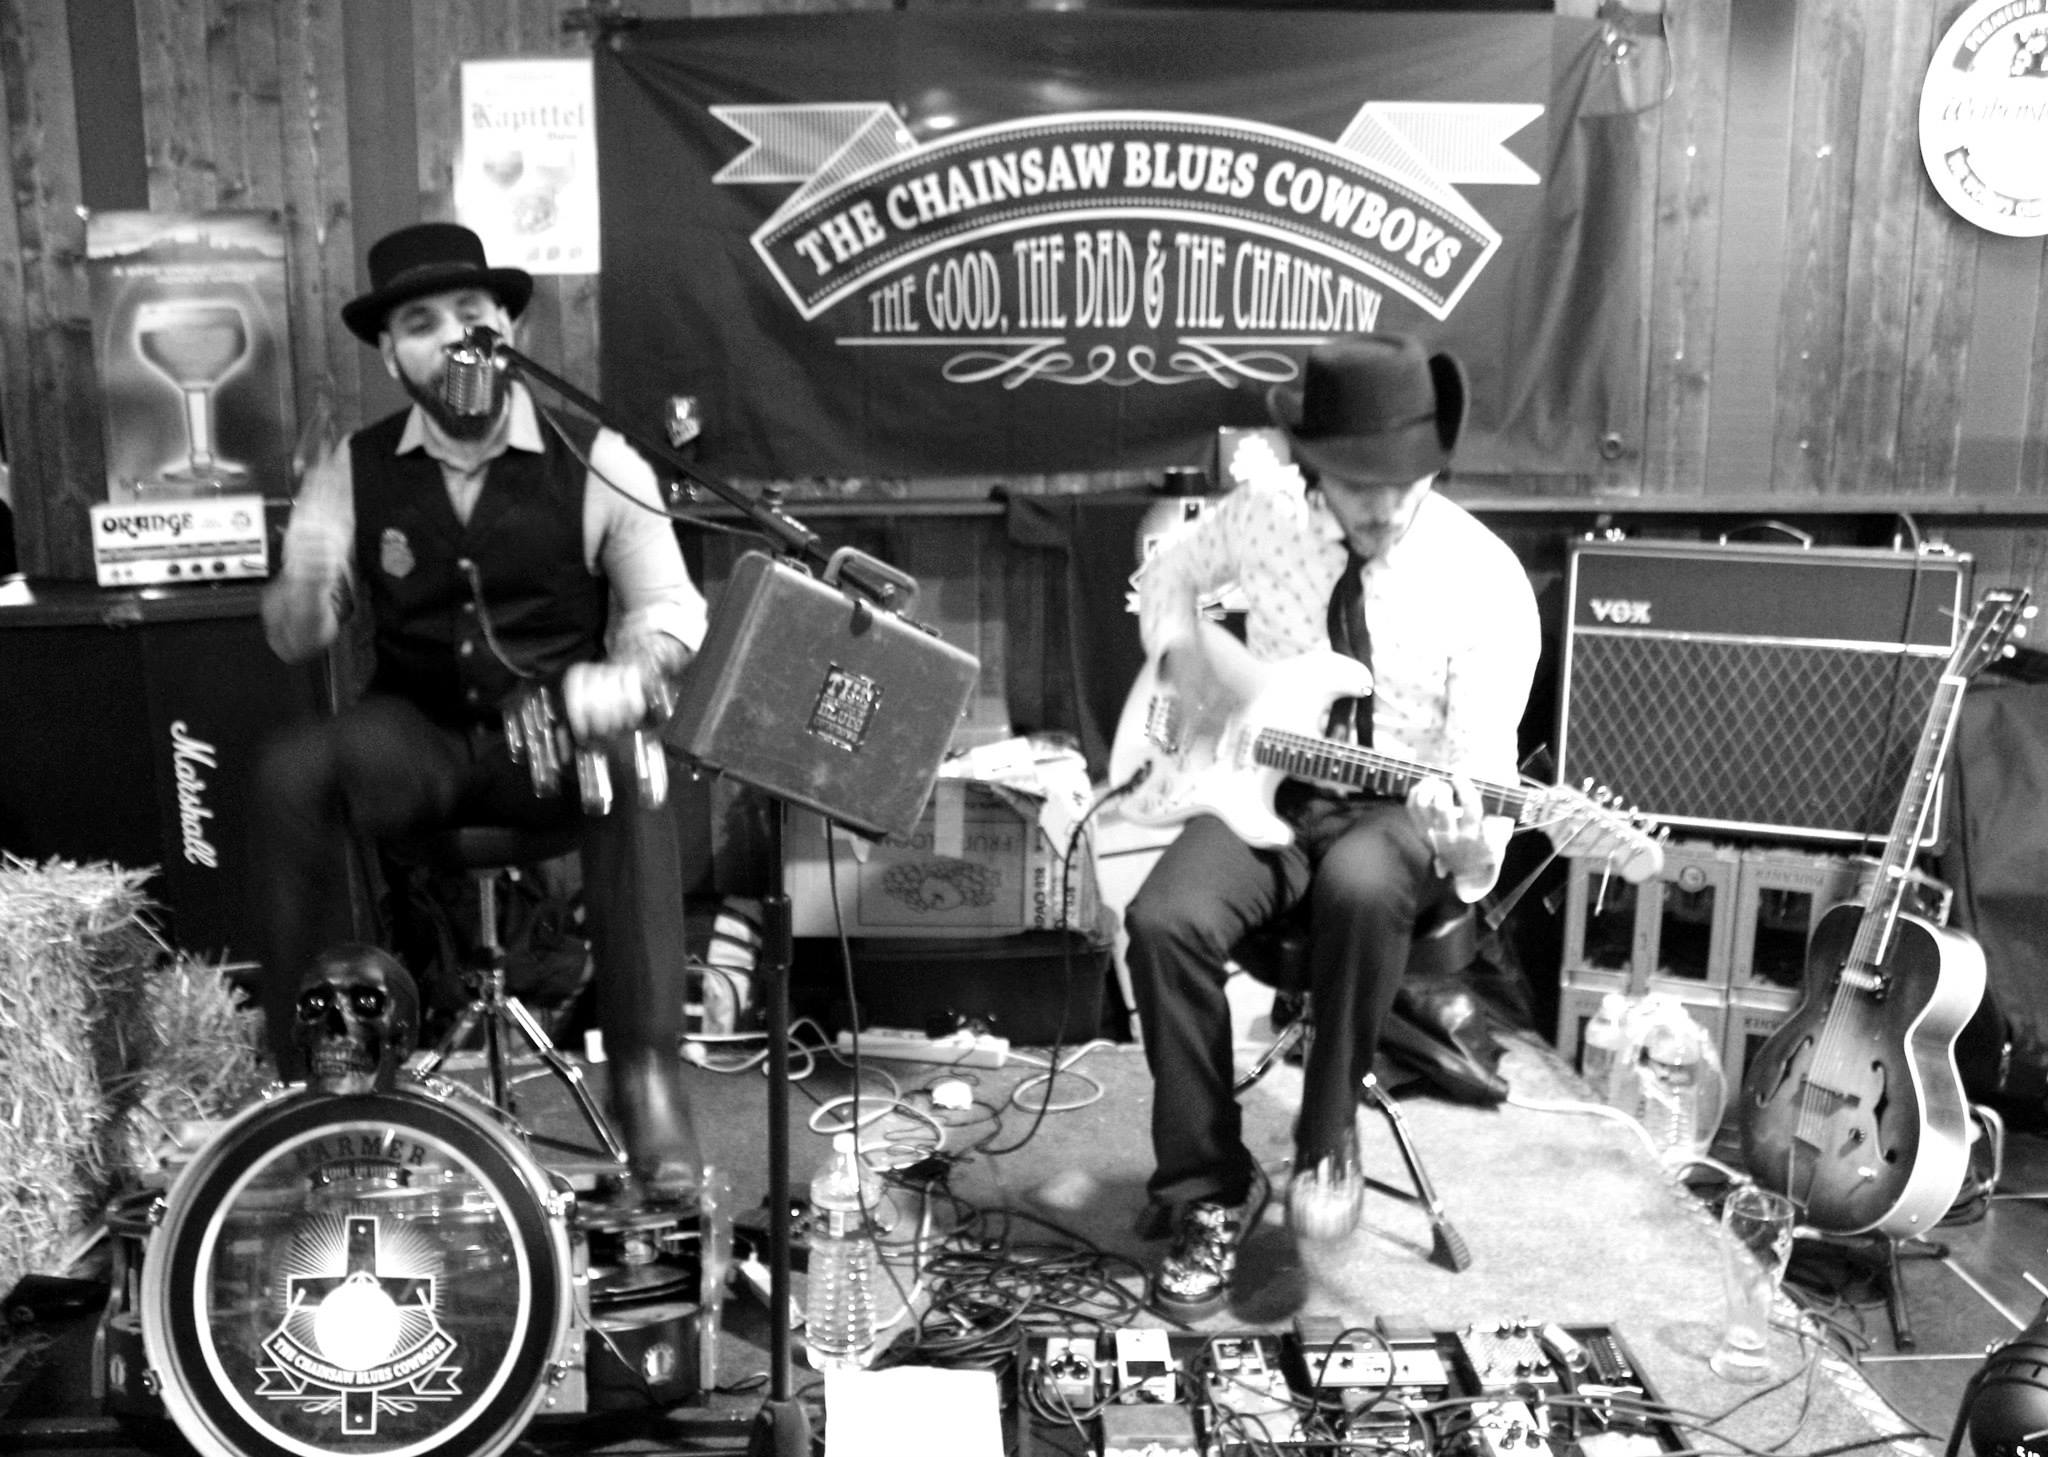 Chainsaw Blues Cowboys